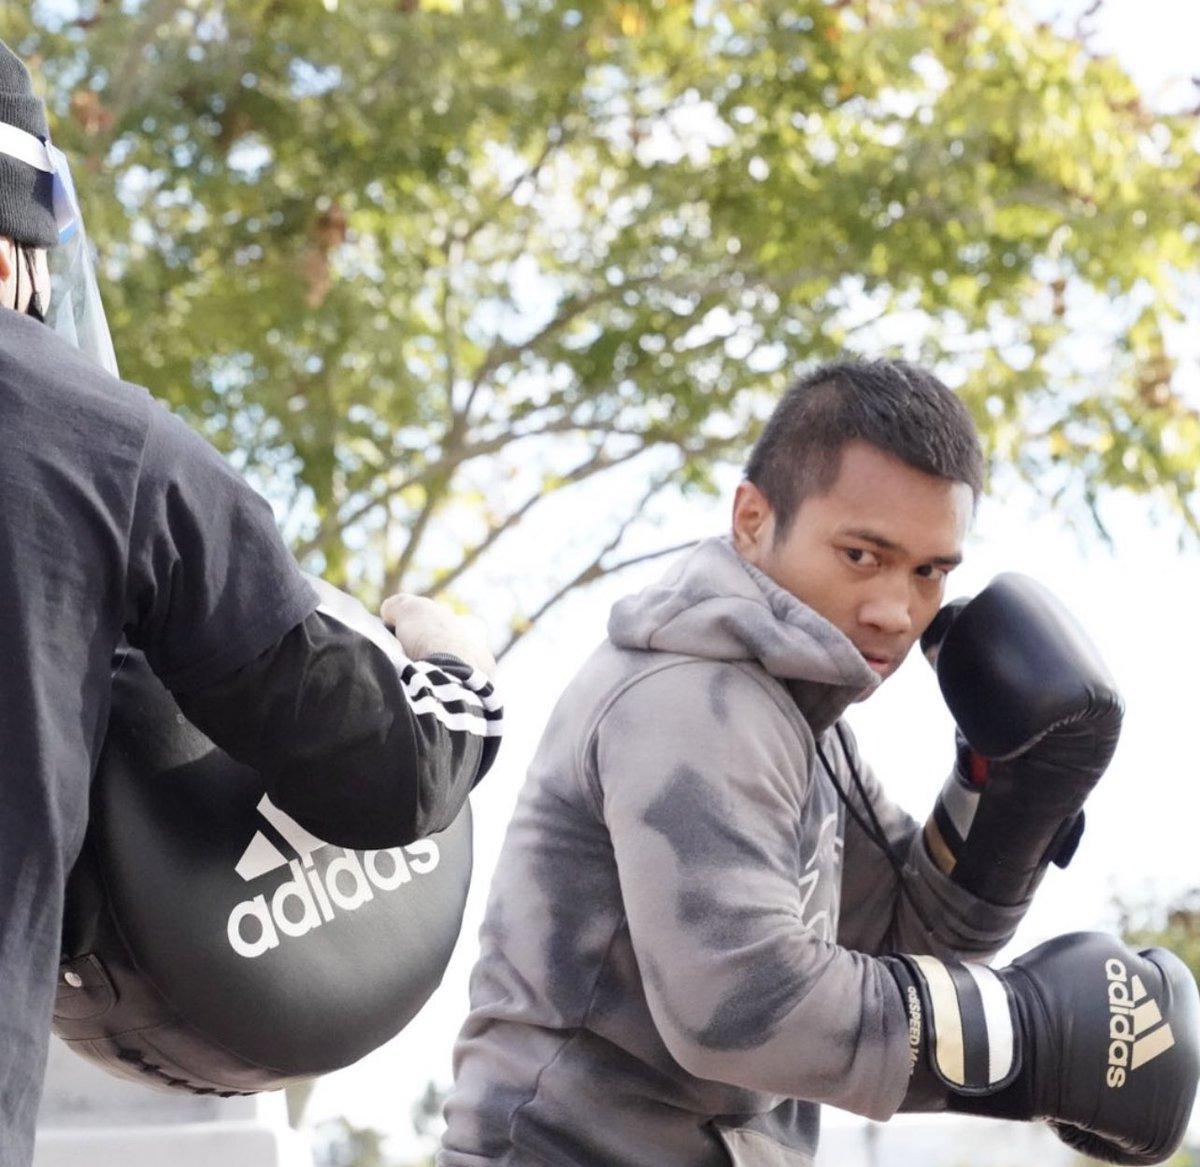 Ignore the noise and stay focused on your goals!  #ReadyForSport #StayingReady #AdidasBoxing  #HomeTeam #HereToCreate #LabanSaBayan #Boxing #MercitoGesta  @GoldenBoyBoxing @WildCardBoxing1 @adidasLA @adidas @mrboxingguru @chrisdessalles @DAZNBoxing   📷: @NeilMacasadia